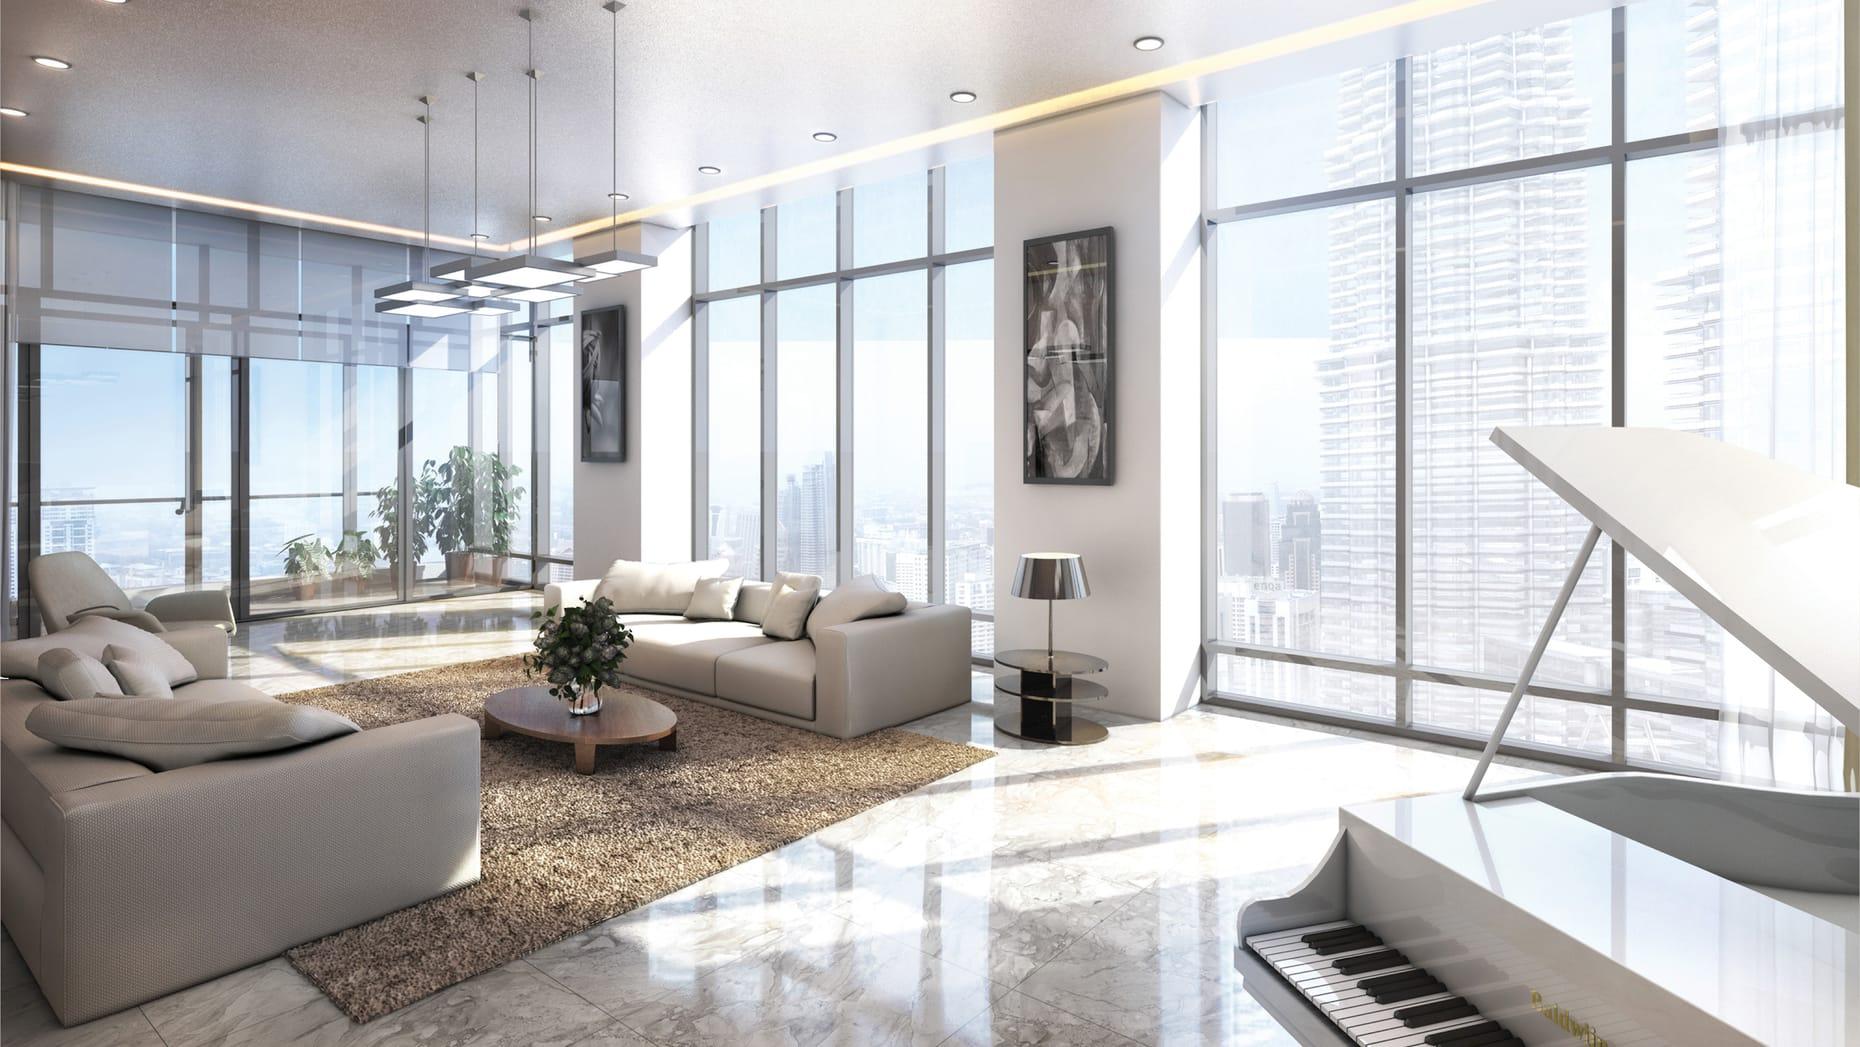 Four Seasons Private Residences Kuala Lumpur